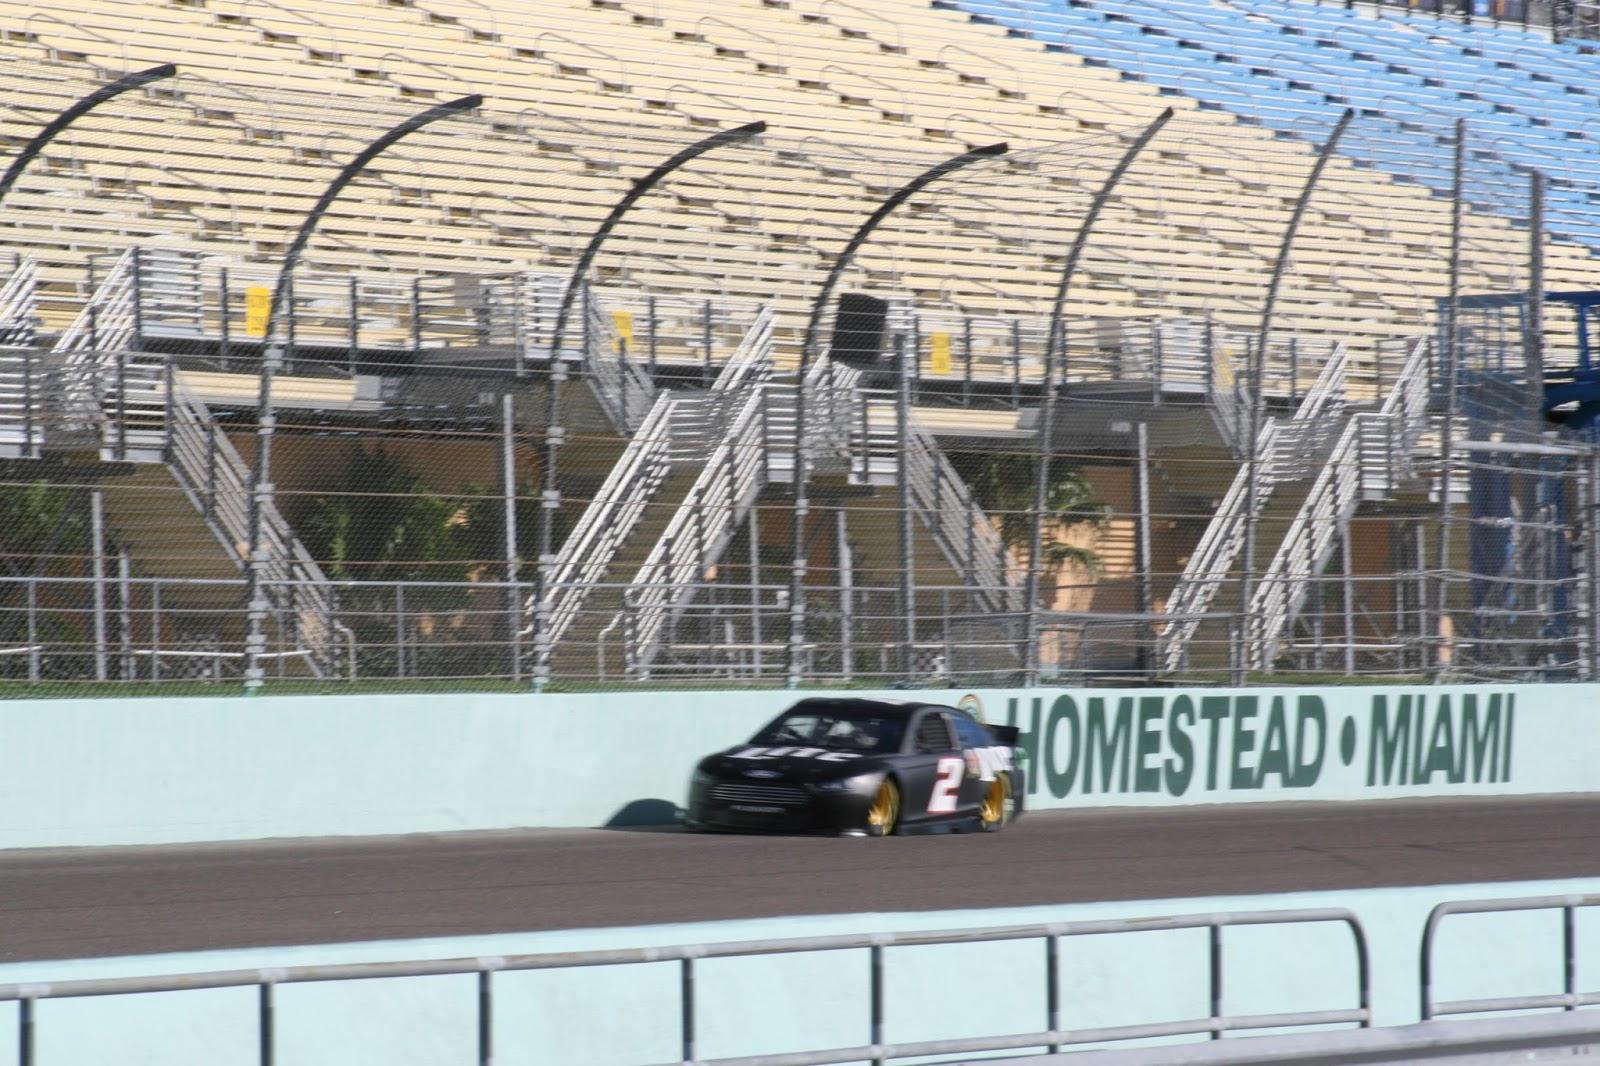 Last lap testing 1 2 3 for Homestead motor speedway schedule